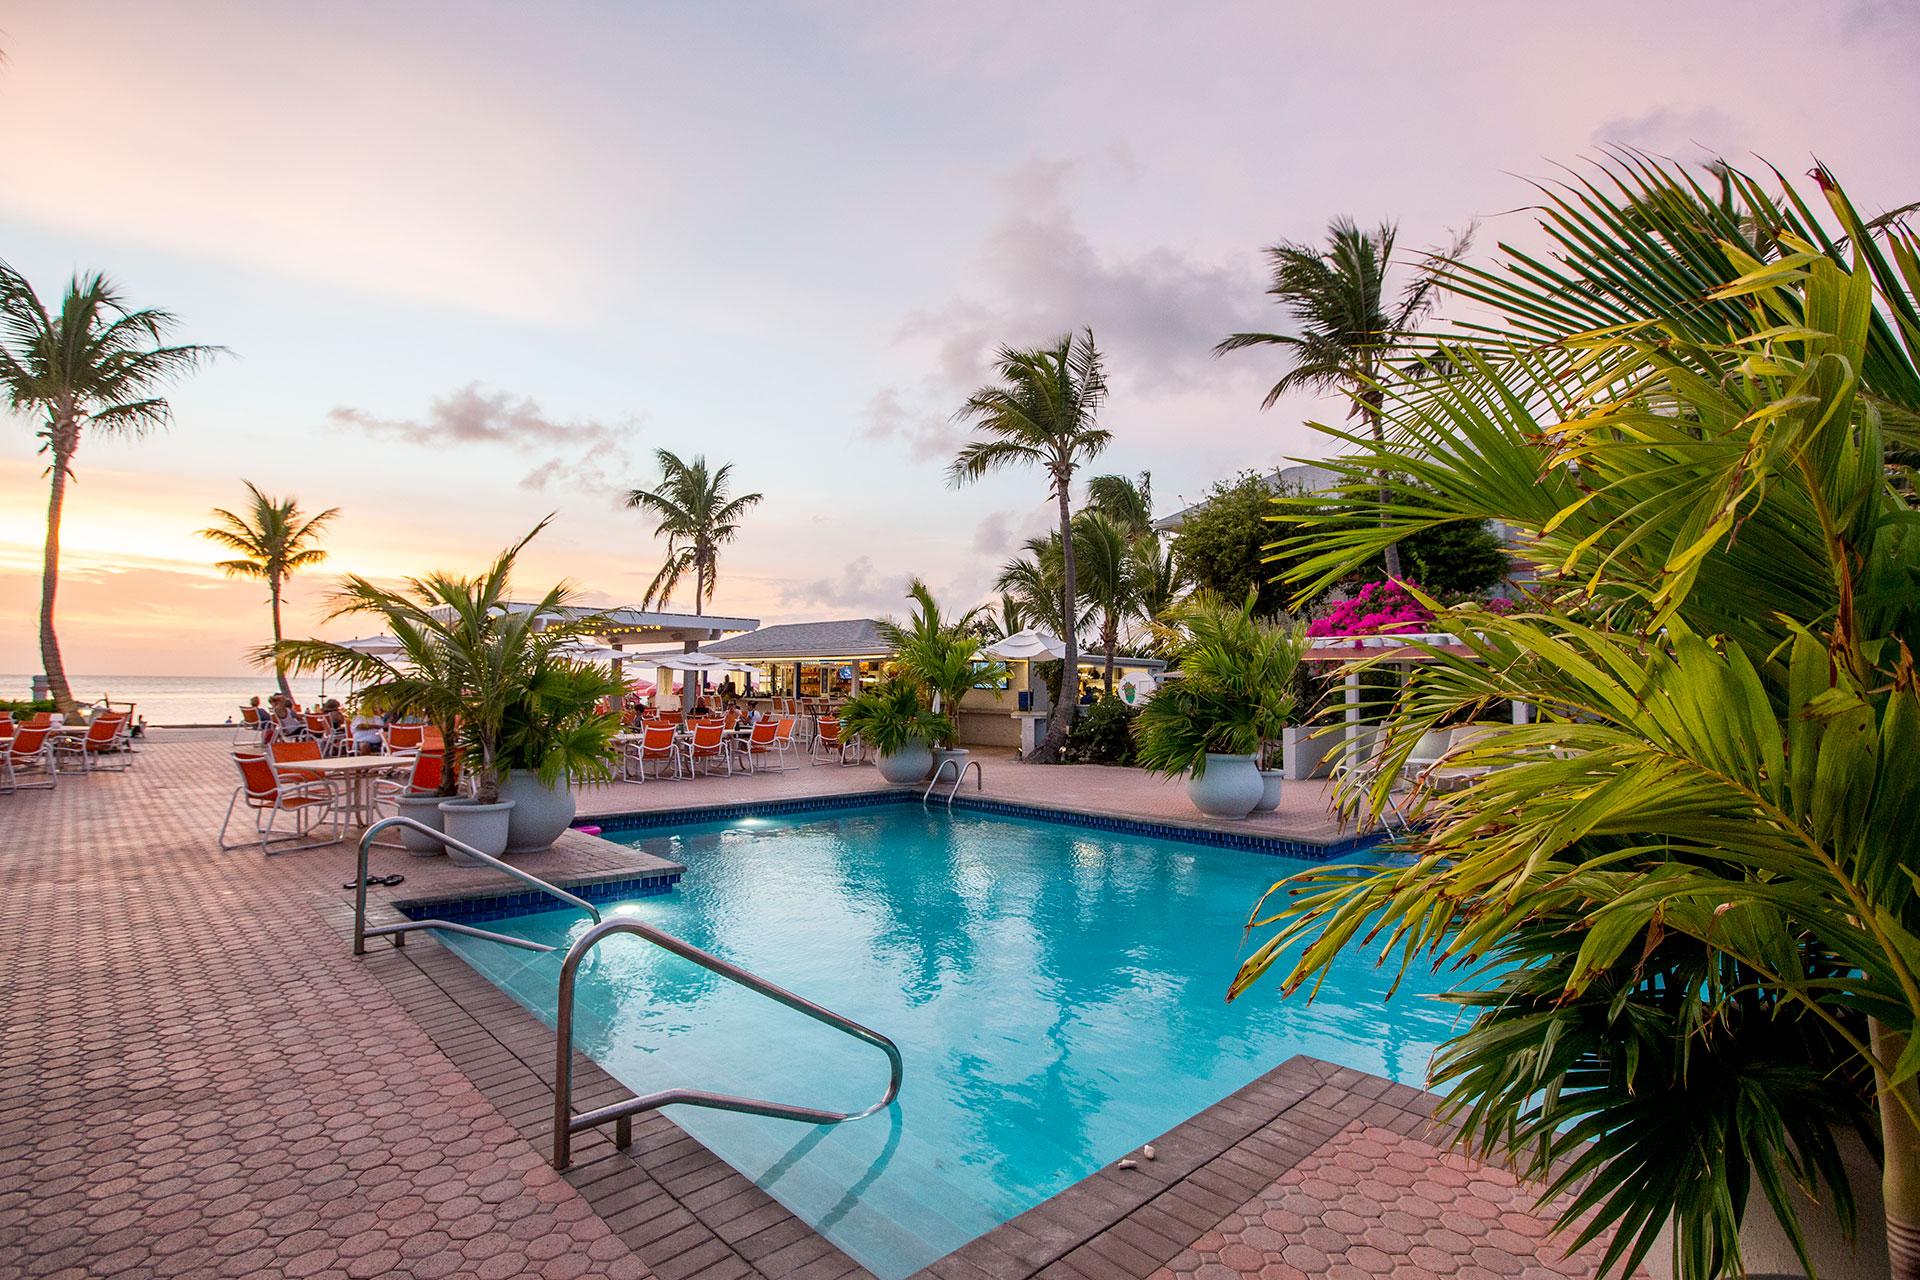 Ocean Club West in Turks and Caicos; Courtesy of Ocean Club Resorts